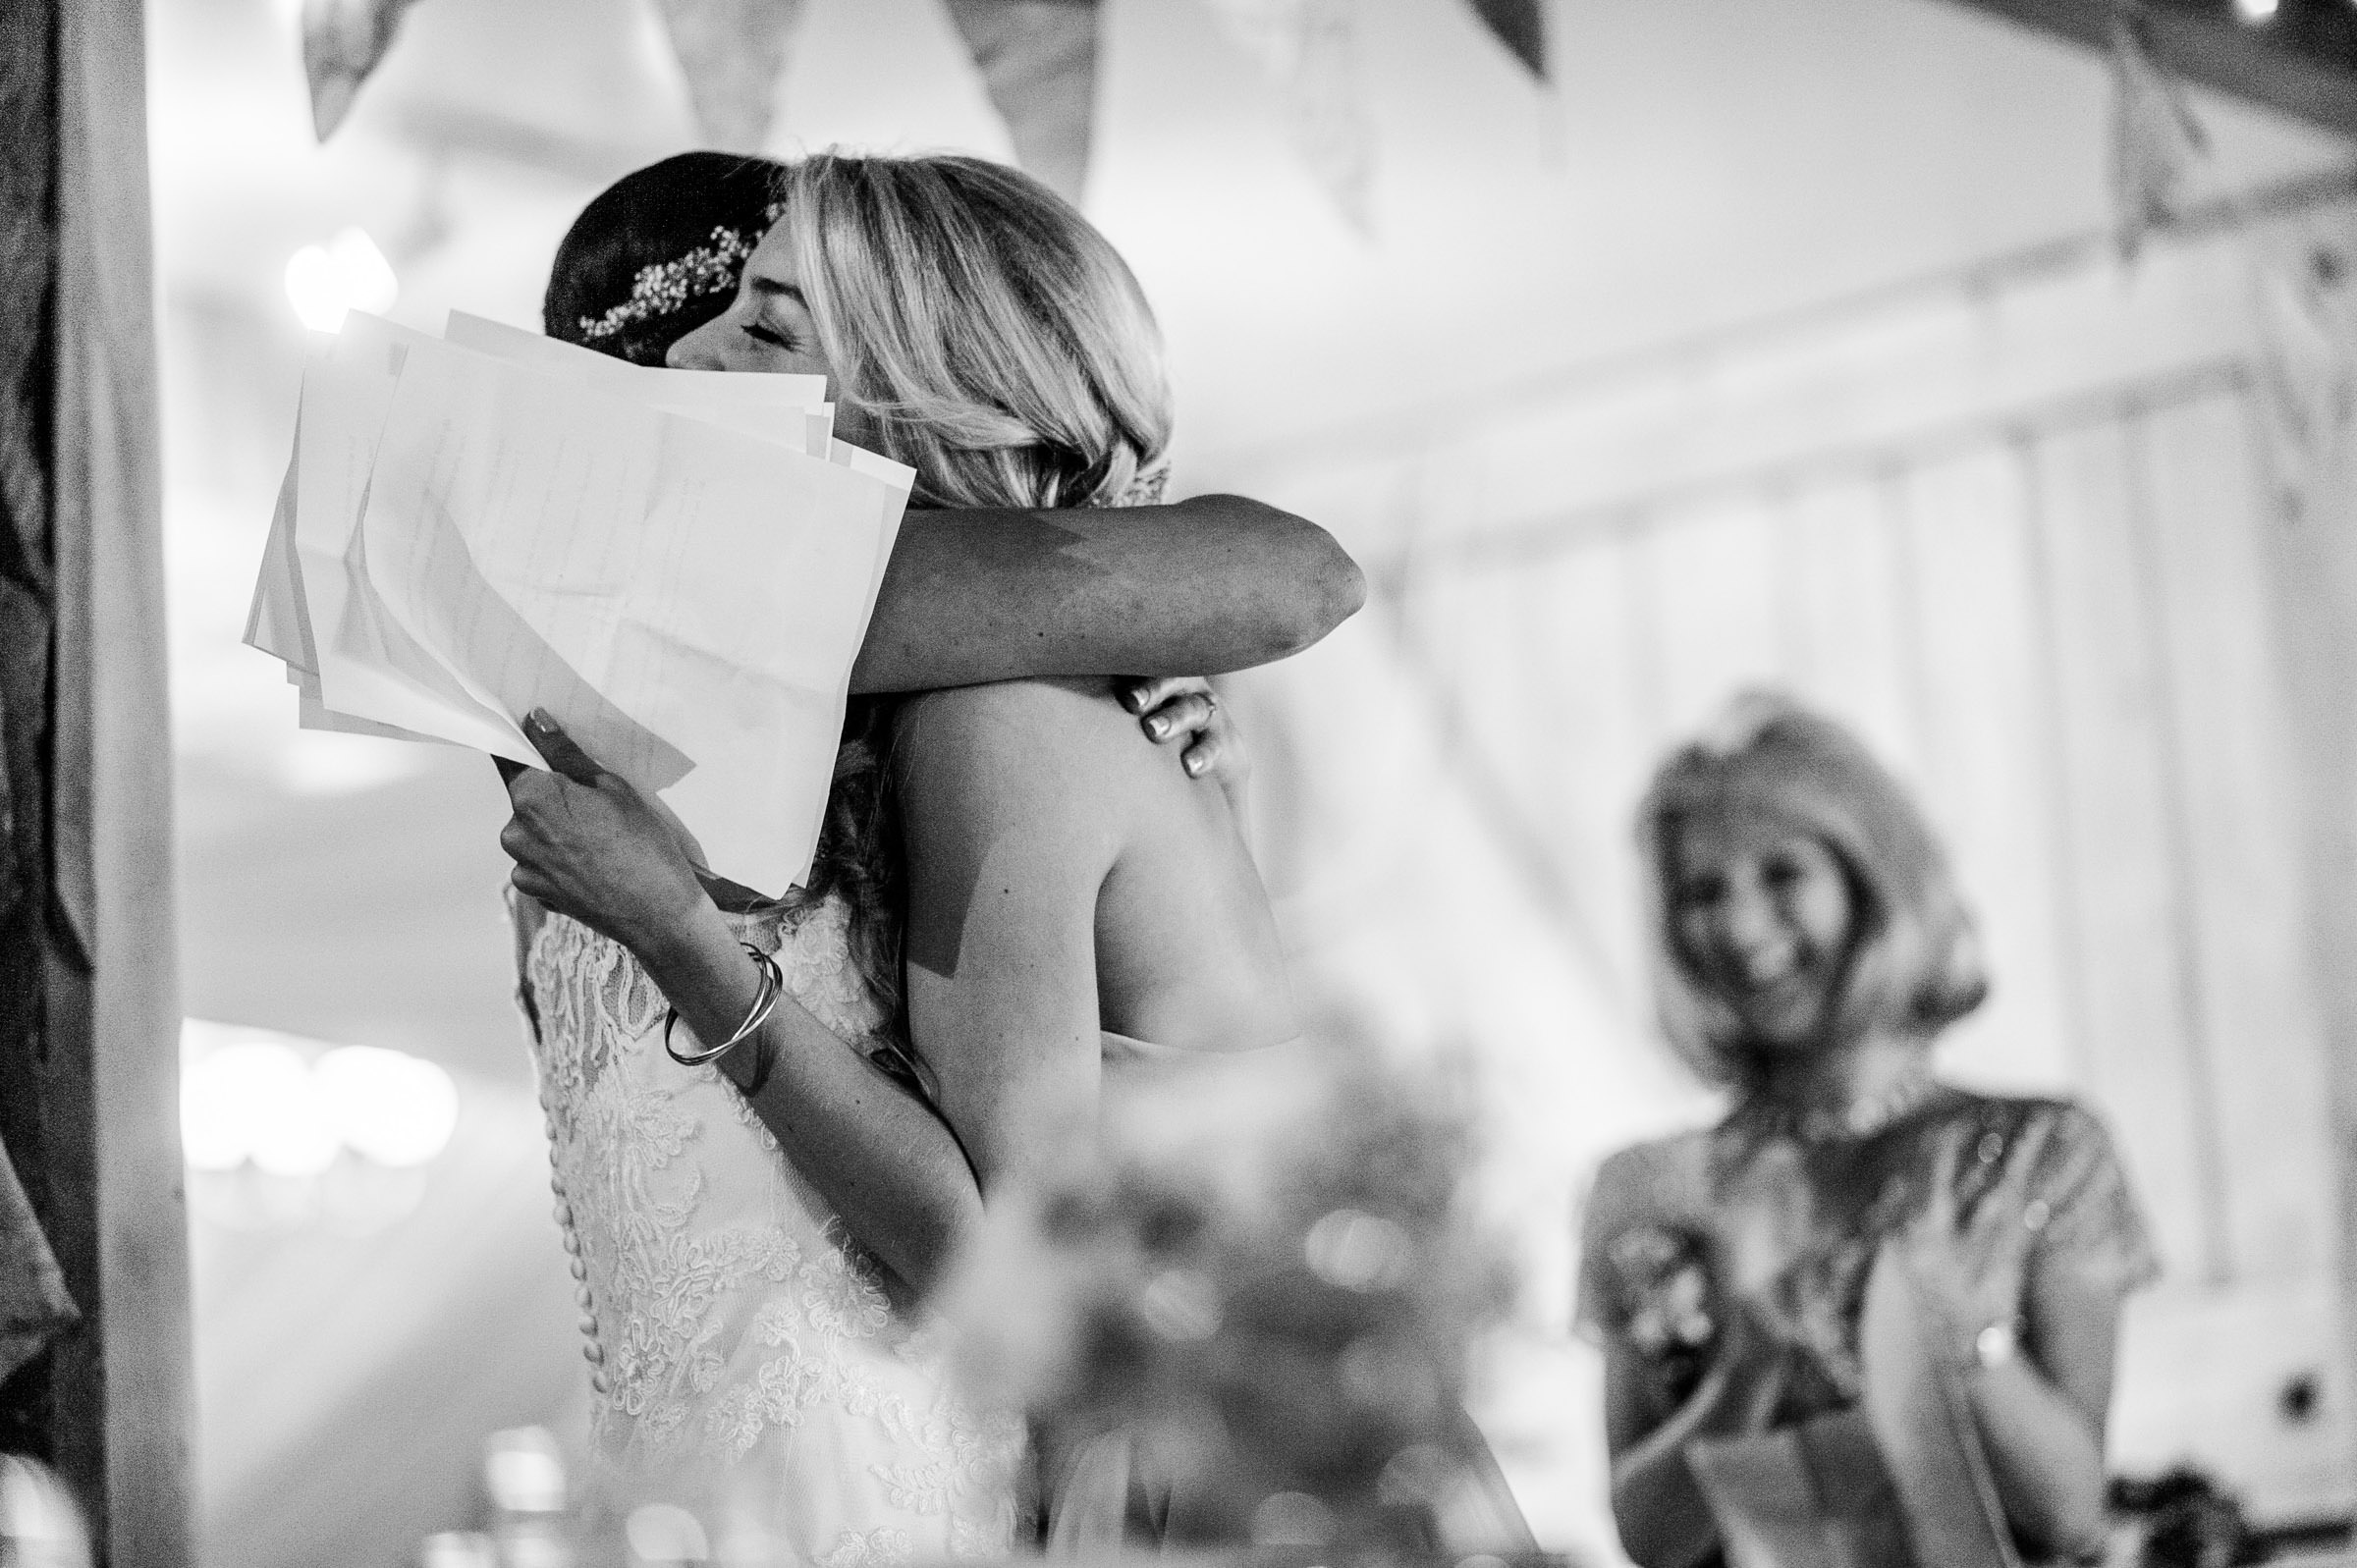 Notley Tythe Barn Reportage Wedding Photos 033.jpg